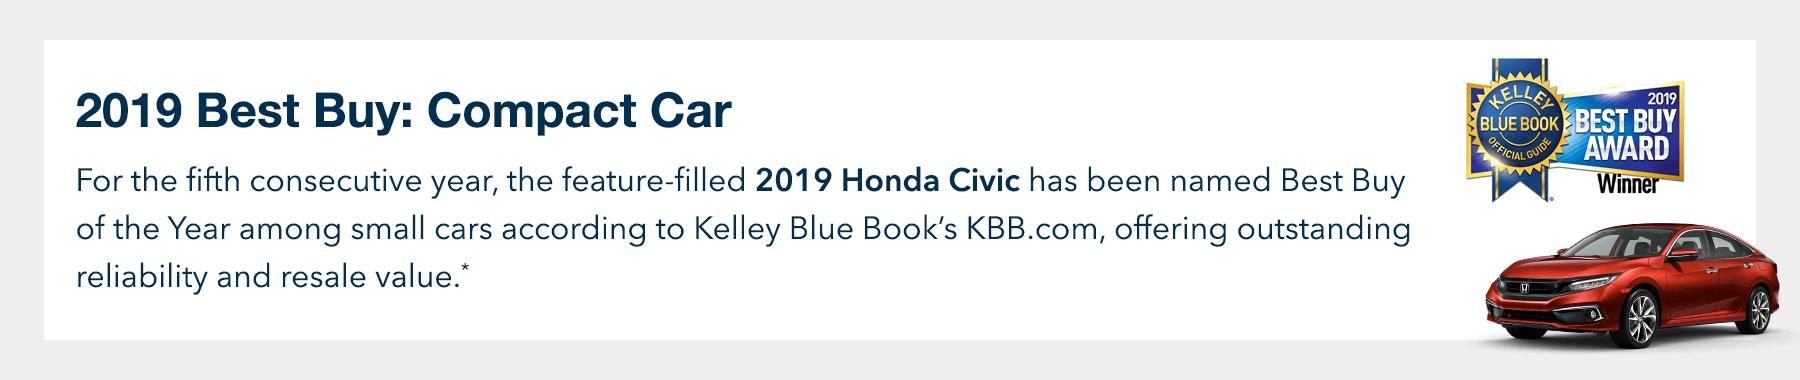 2019 Honda Civic Sedan Kelley Blue Book Best Buy: Compact Car Award Slider